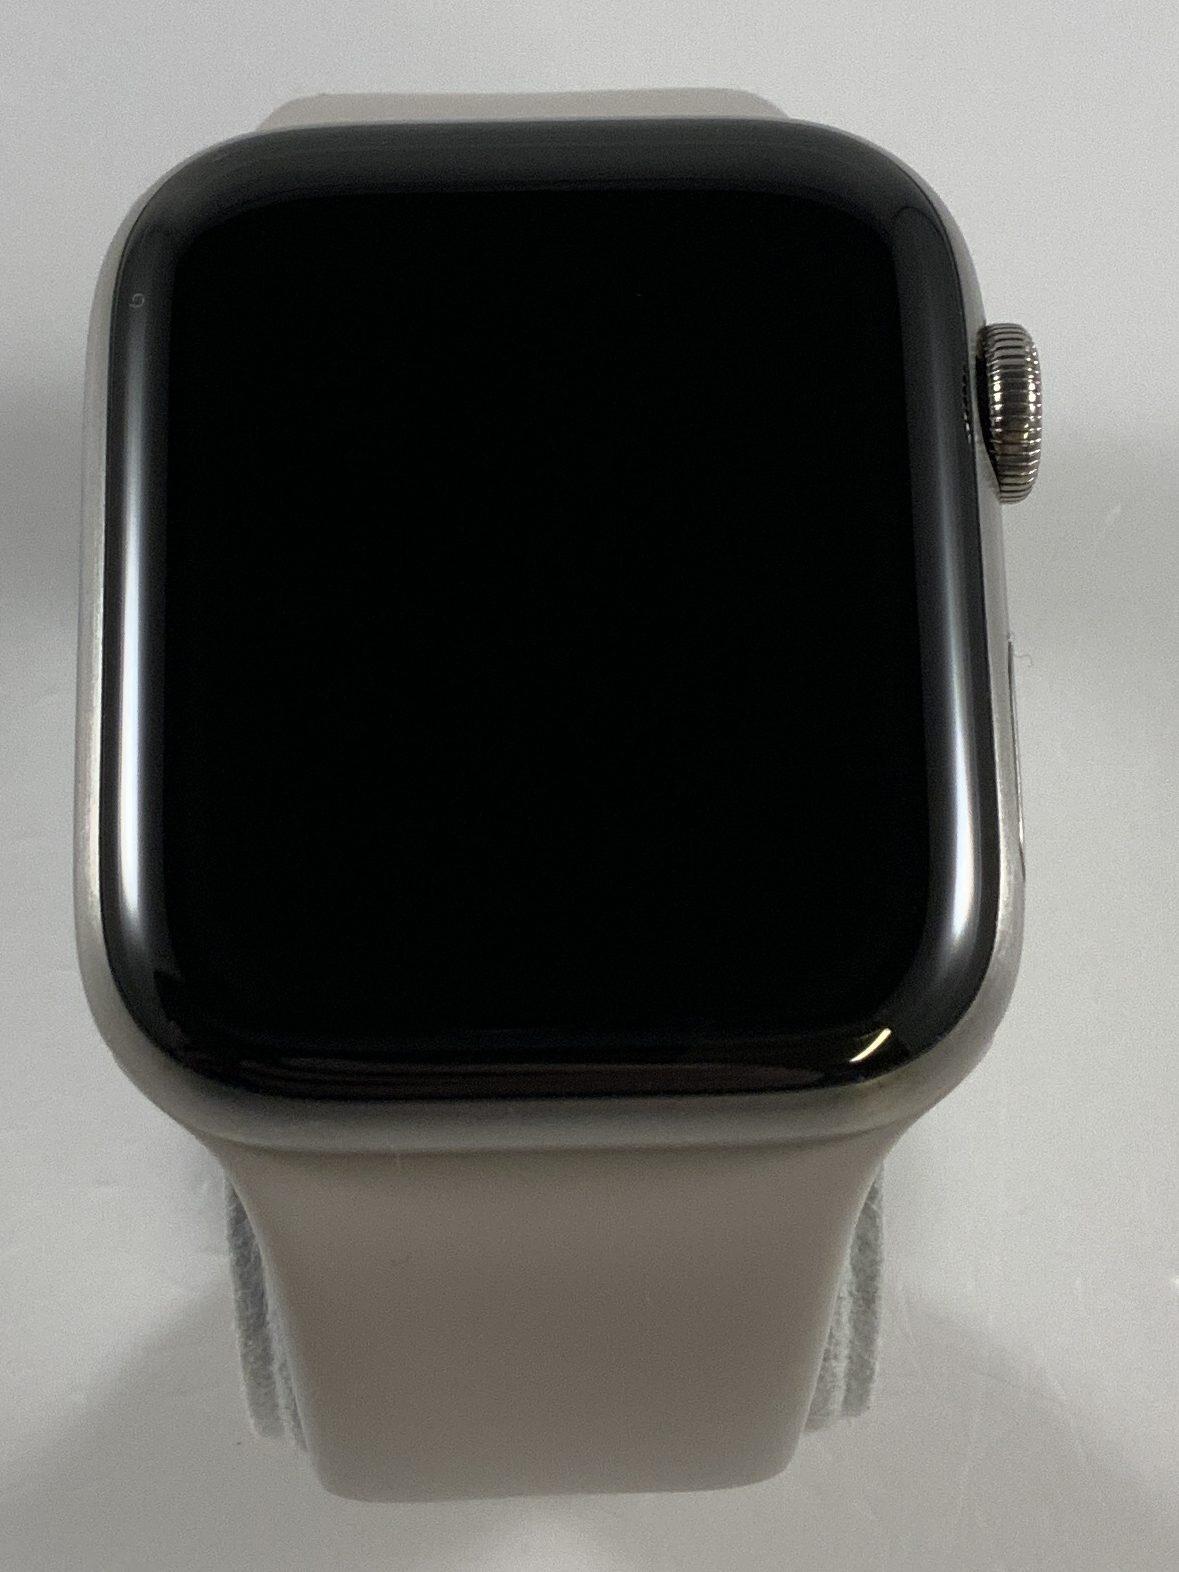 Watch Series 5 Steel Cellular (44mm), Titanium, Kuva 1